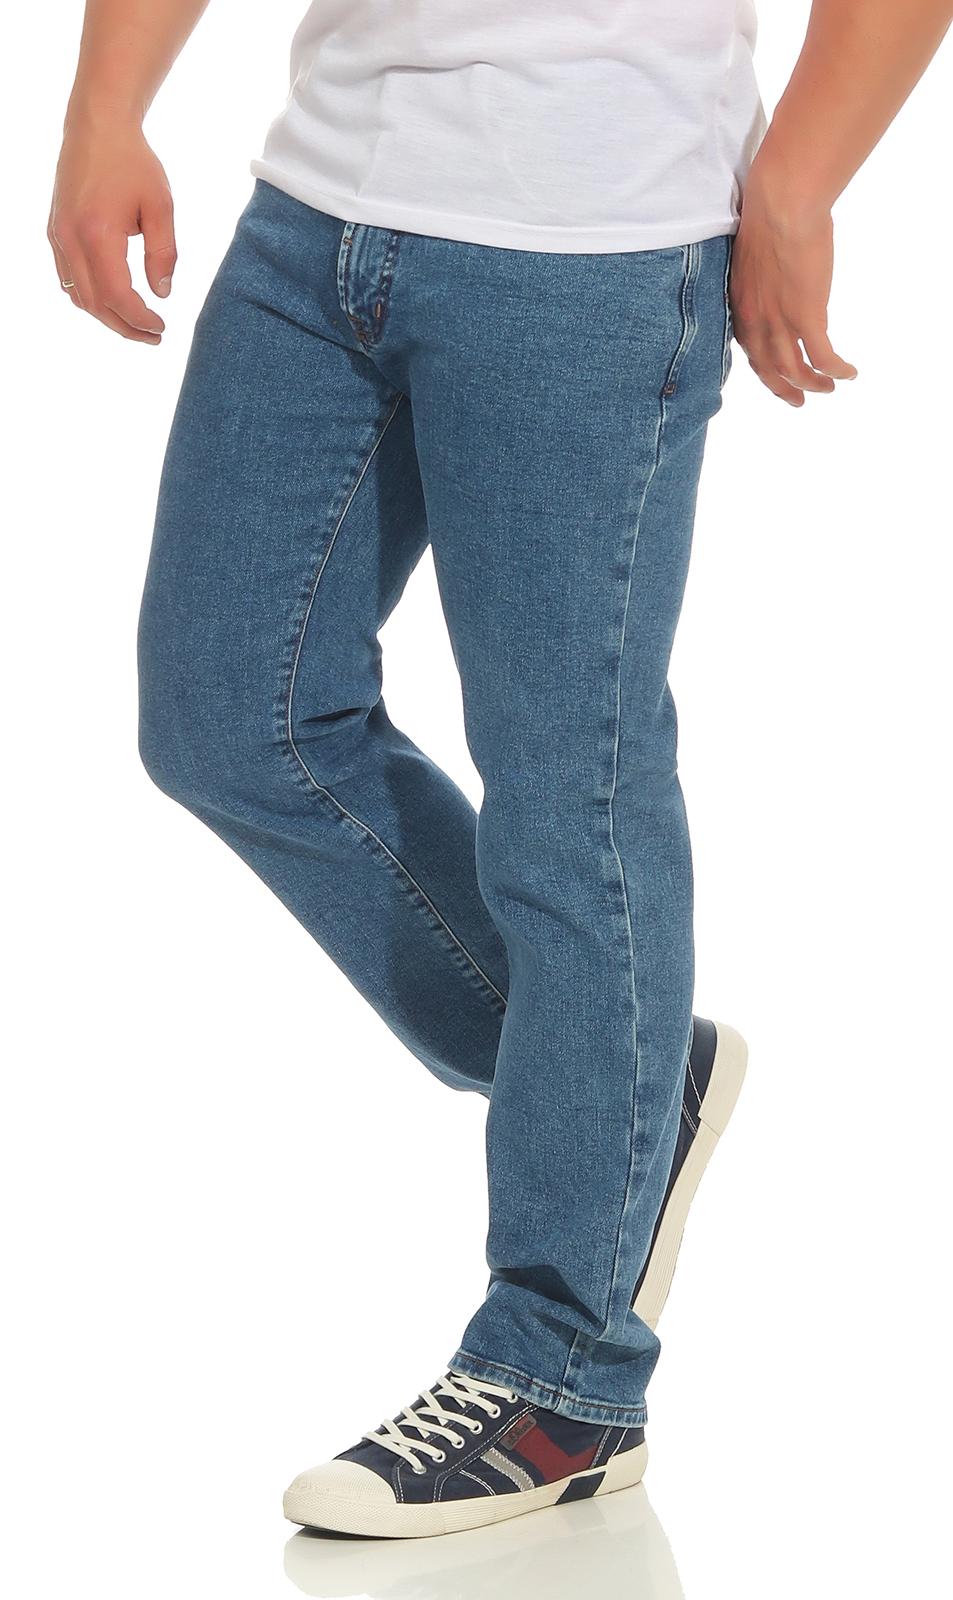 PIERRE-CARDIN-Herren-Jeans-Dijon-Hose-Comfort-Stretch-Freizeitjeans-Modern-NEU-3 Indexbild 7